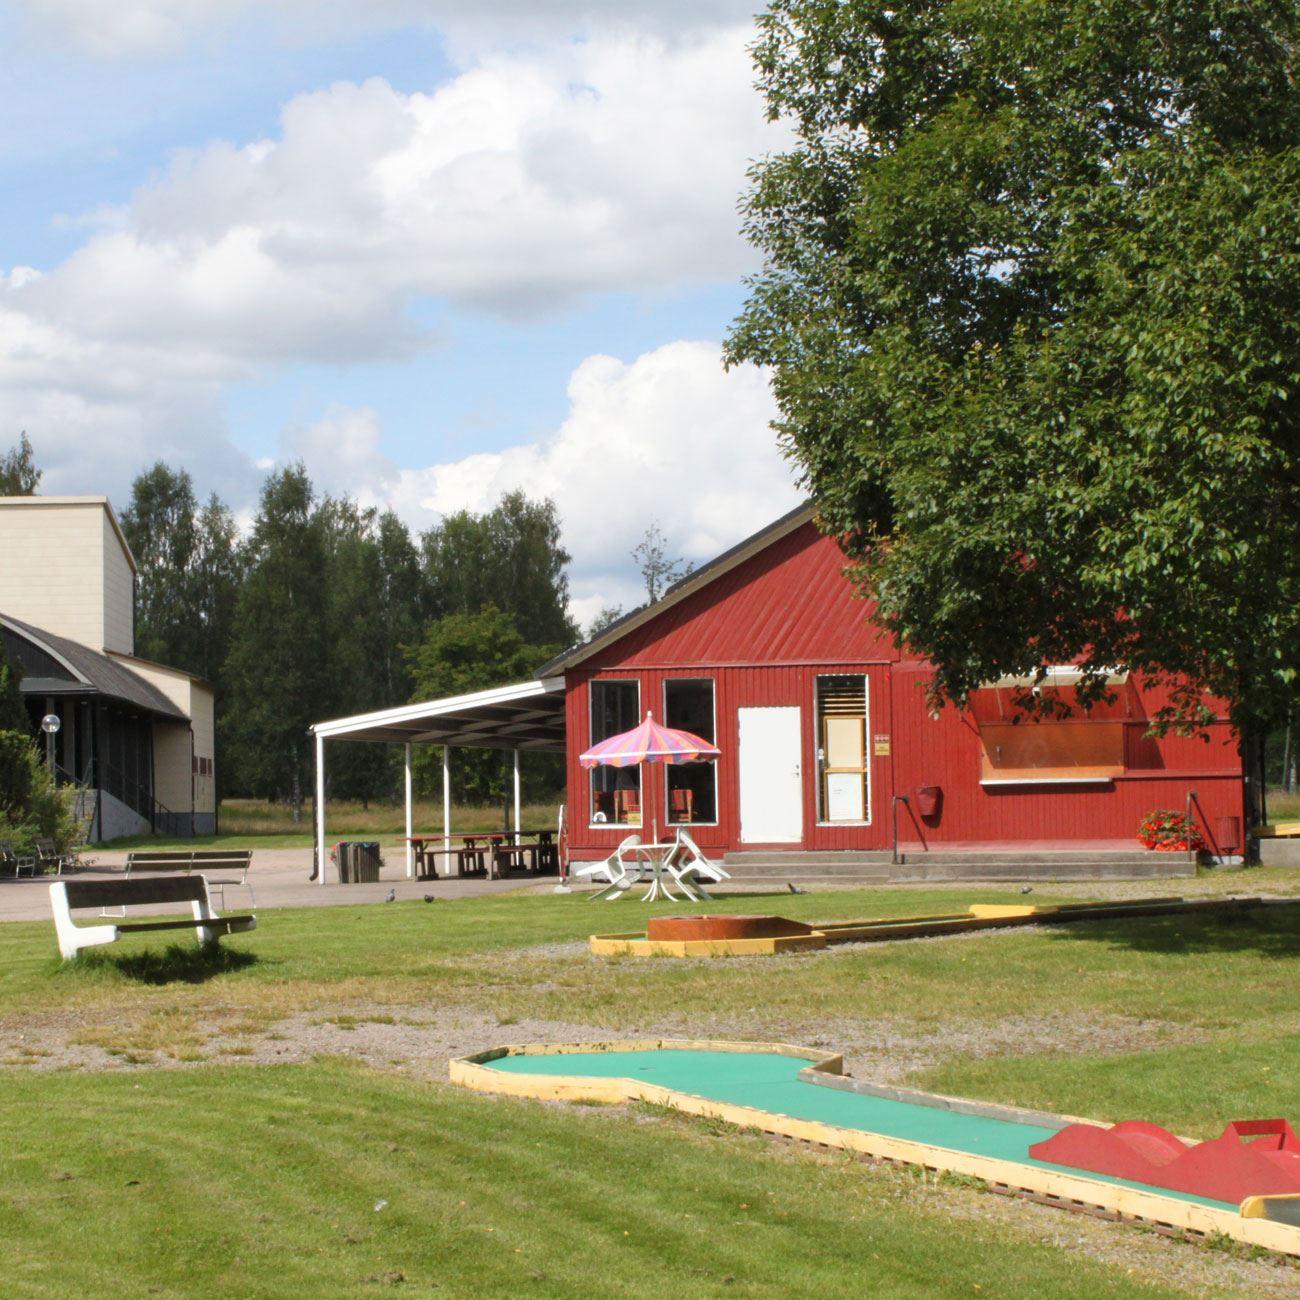 Foto: Värnamo Näringsliv AB,  © Värnamo Näringsliv AB , Folkets park Minigolf und Kinderspielplatz